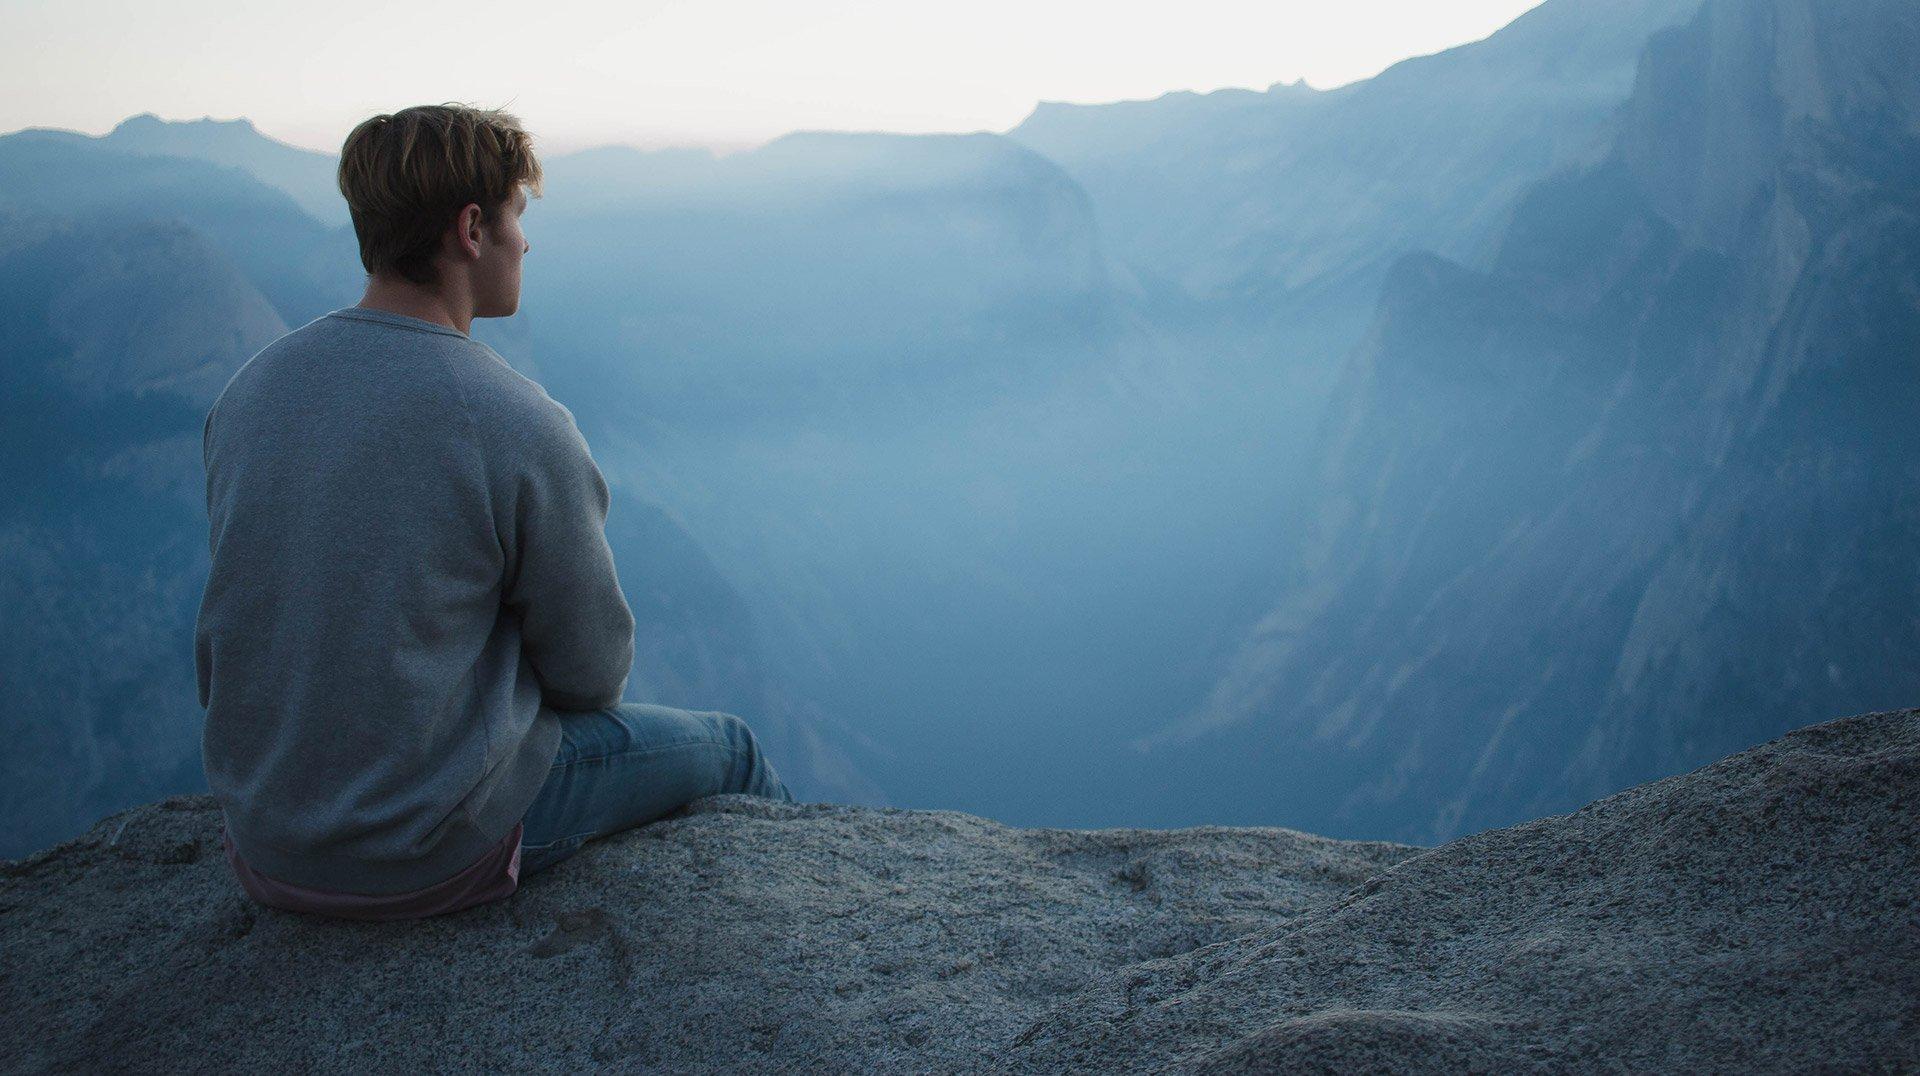 meditation-athletes-hero